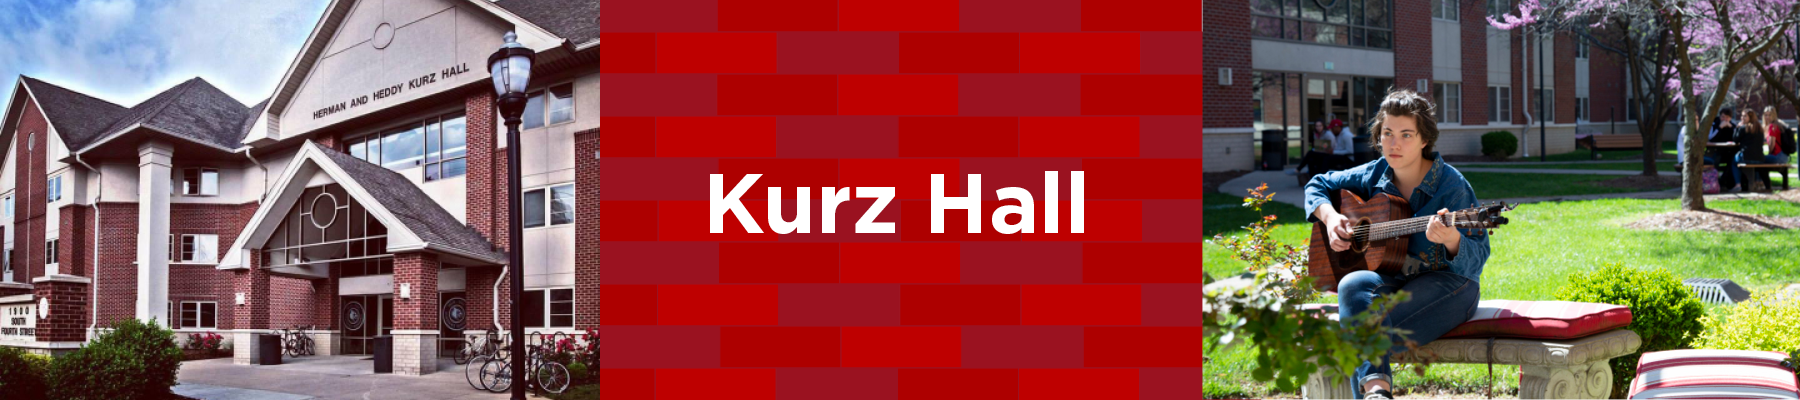 student in interior courtyard of kurz hall. Exterior of kurz hall is brick